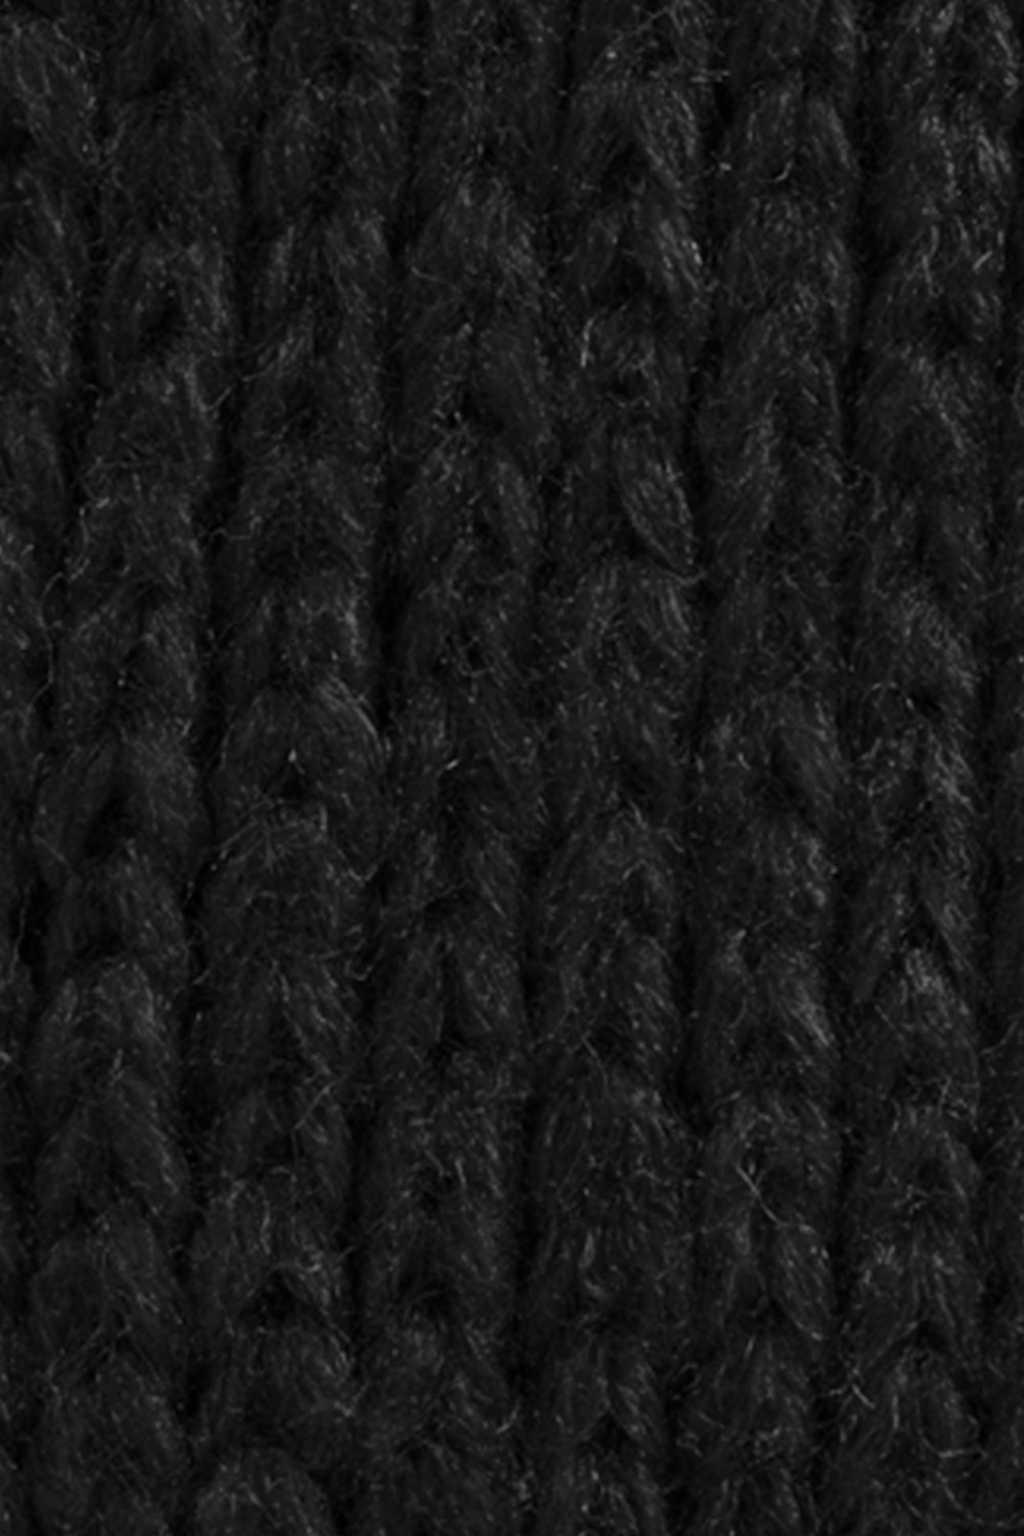 Scarf J002 Black 13